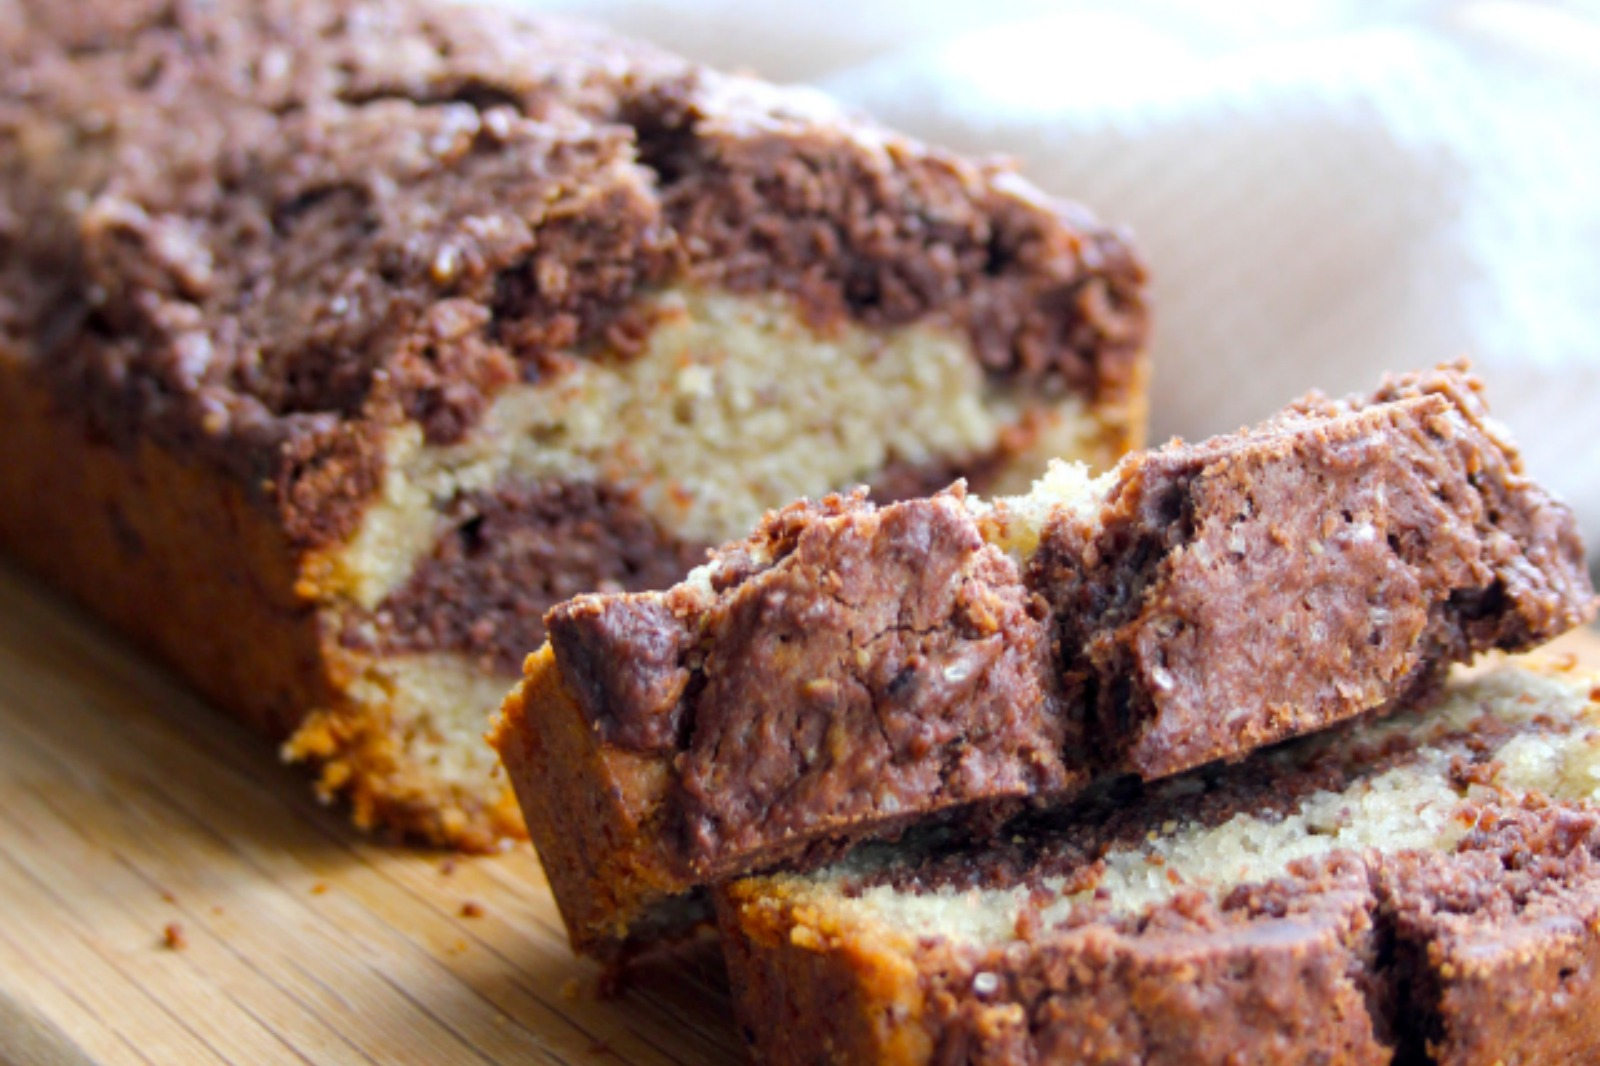 Chocolate Marble Cake 'Marbré au chocolat' [Vegan]